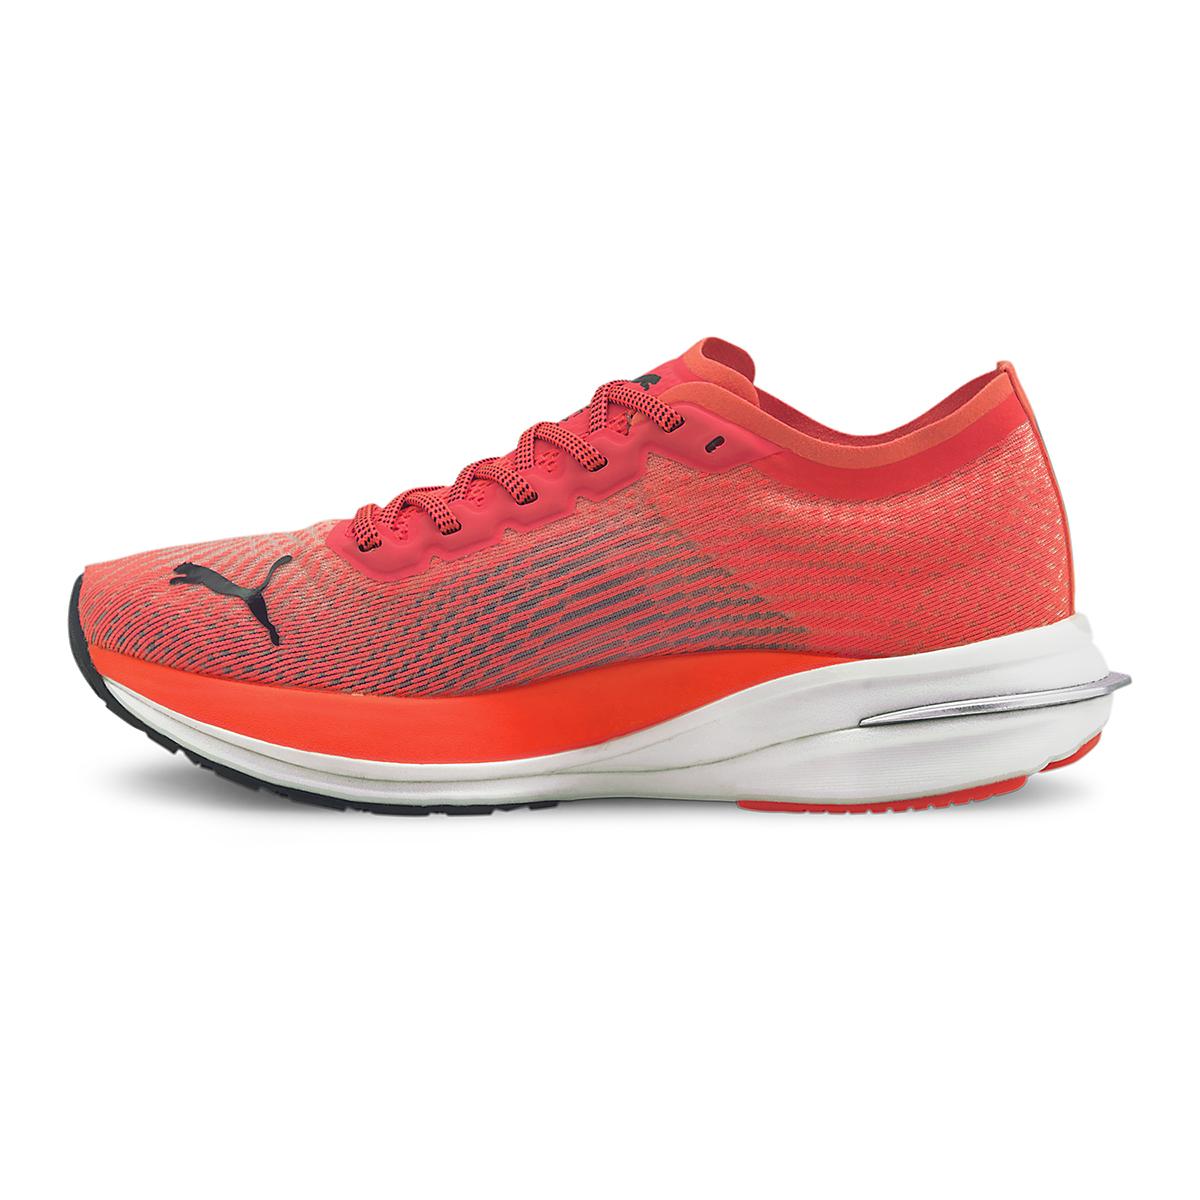 Women's Puma Deviate Nitro Running Shoe - Color: Lava Blast-Puma Black - Size: 5.5 - Width: Regular, Lava Blast-Puma Black, large, image 2